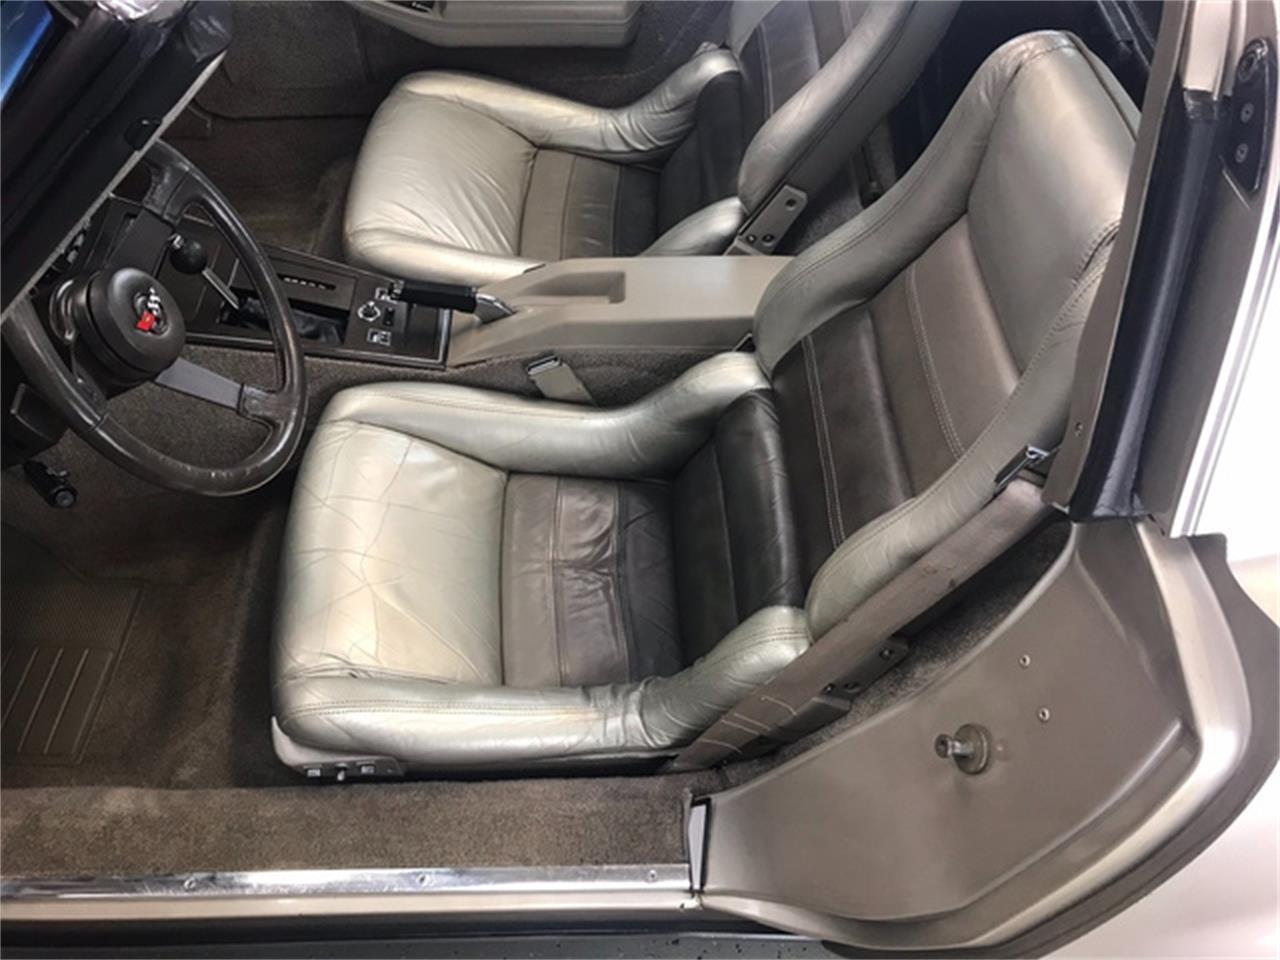 1982 Chevrolet Corvette (CC-1241896) for sale in Shelby Township, Michigan